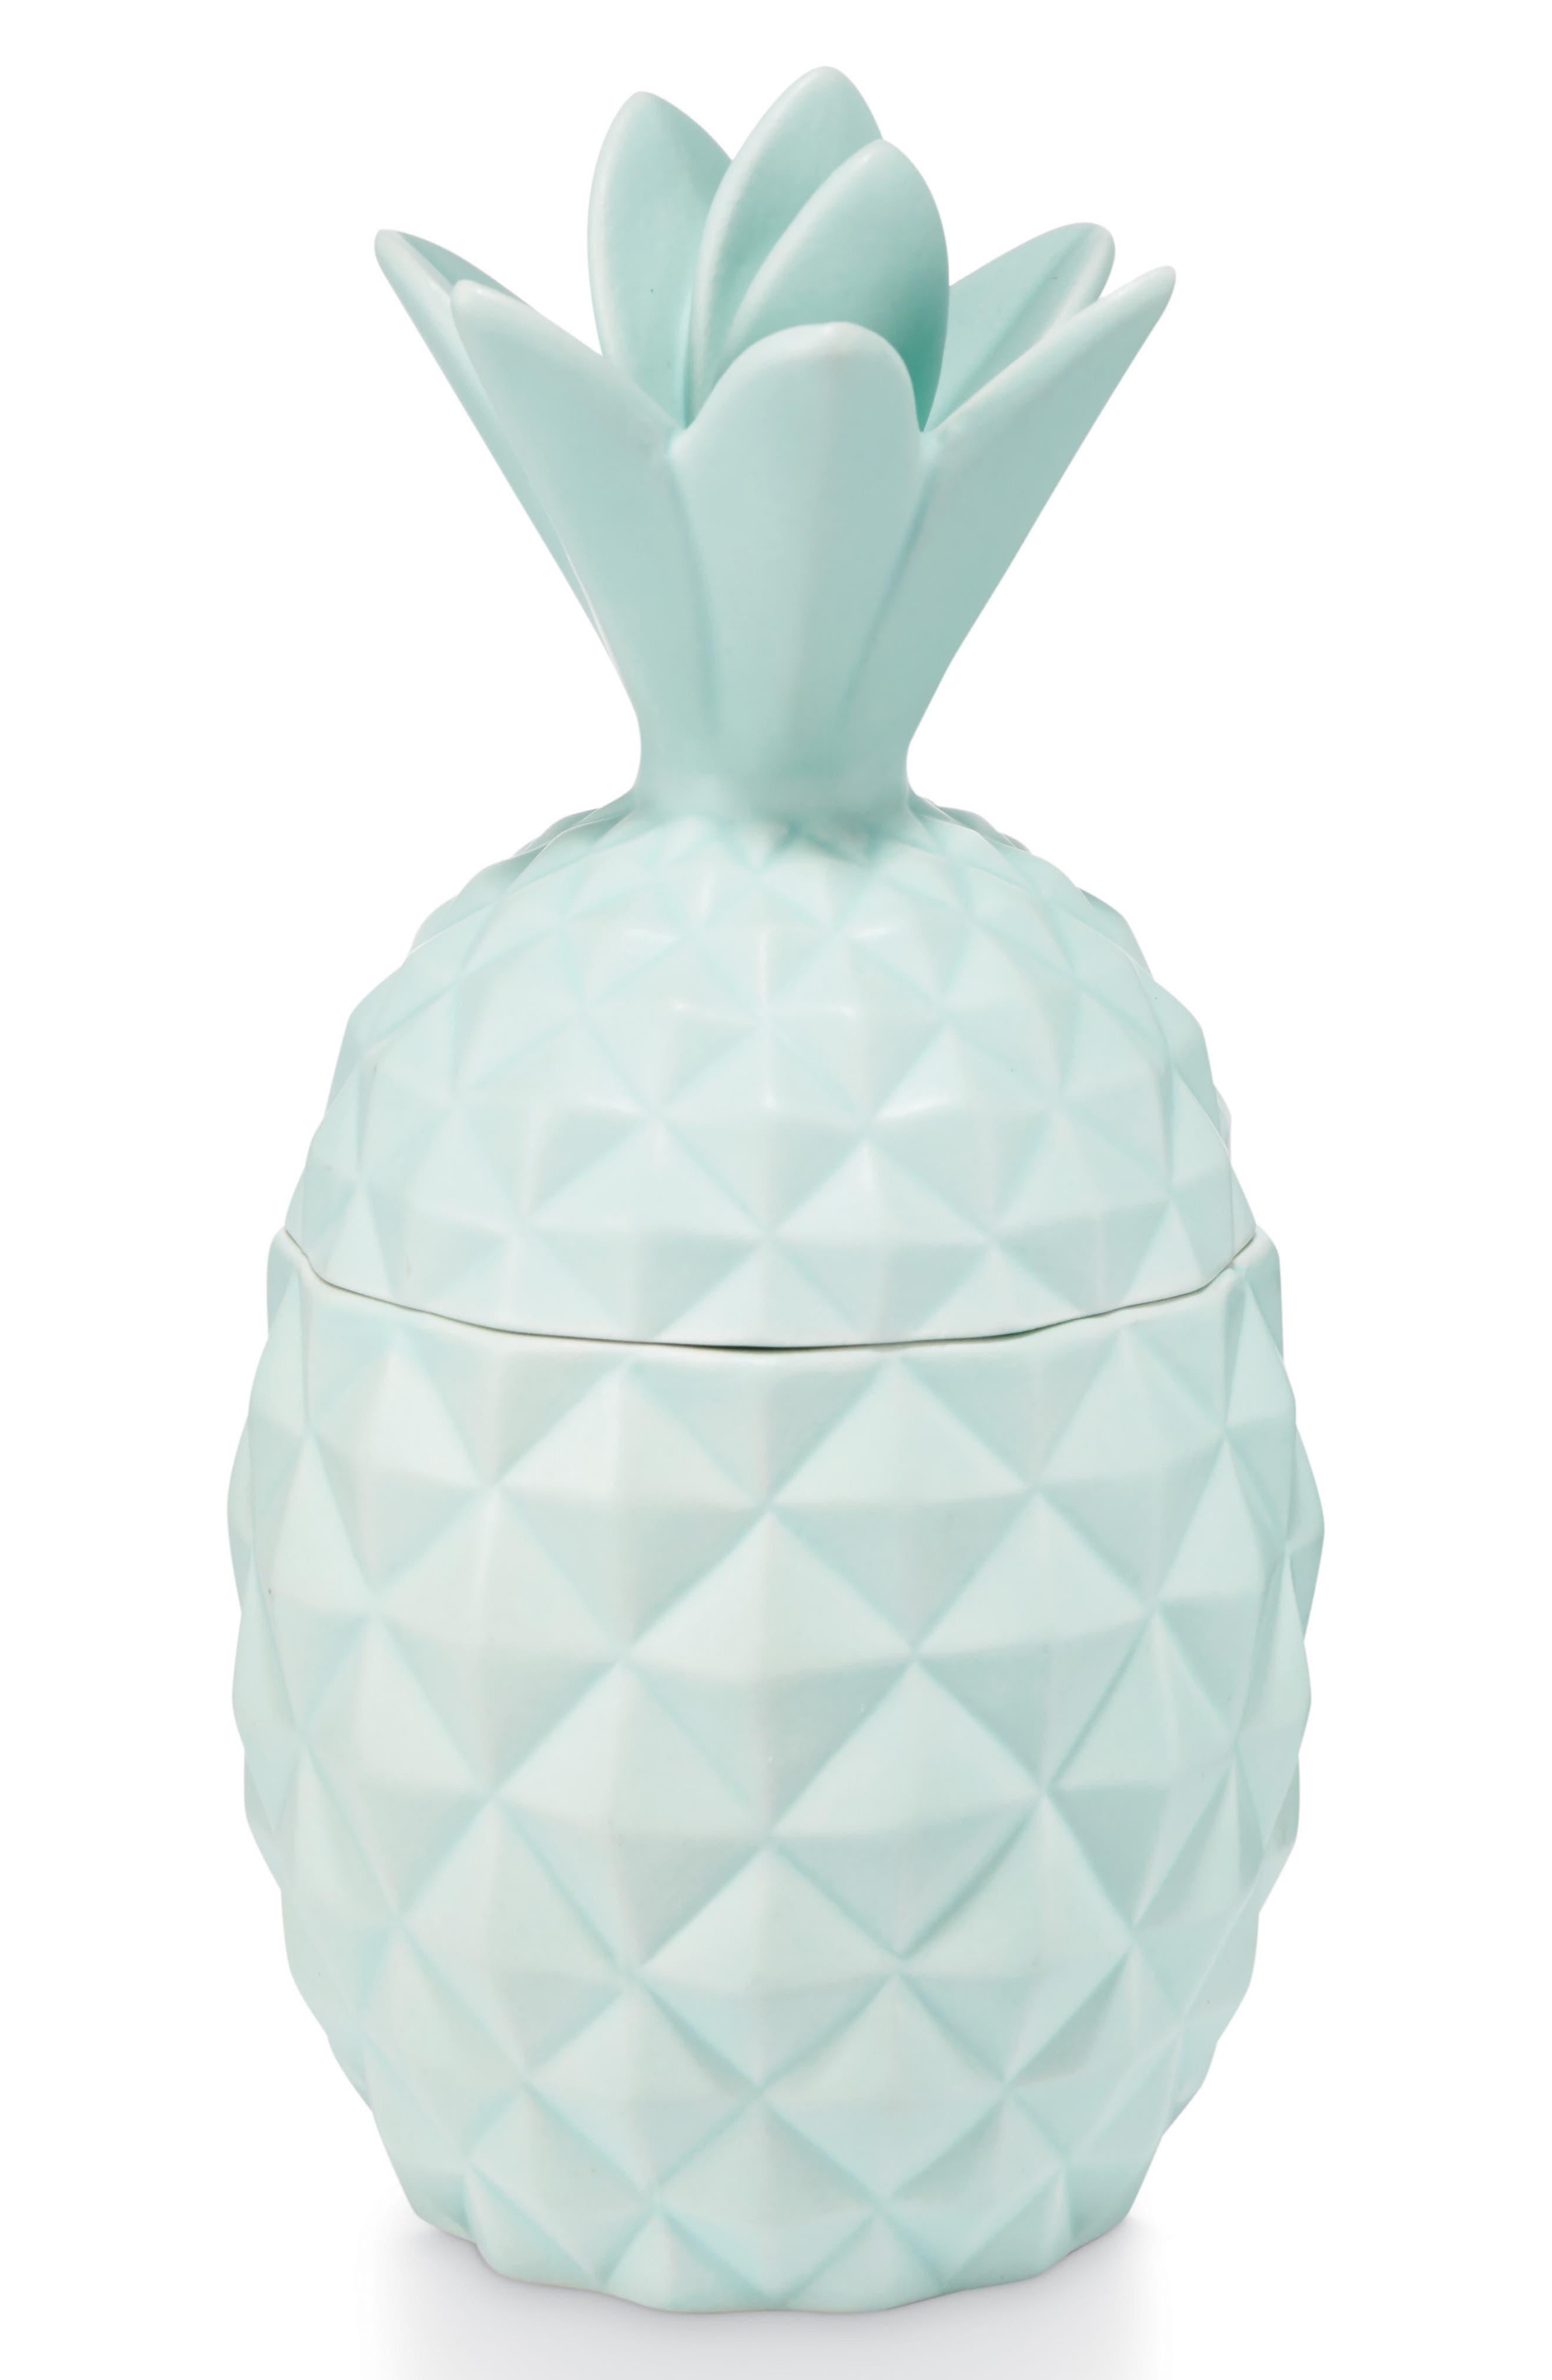 Ceramic Pineapple Jar Candle,                         Main,                         color, Sugared Blossom